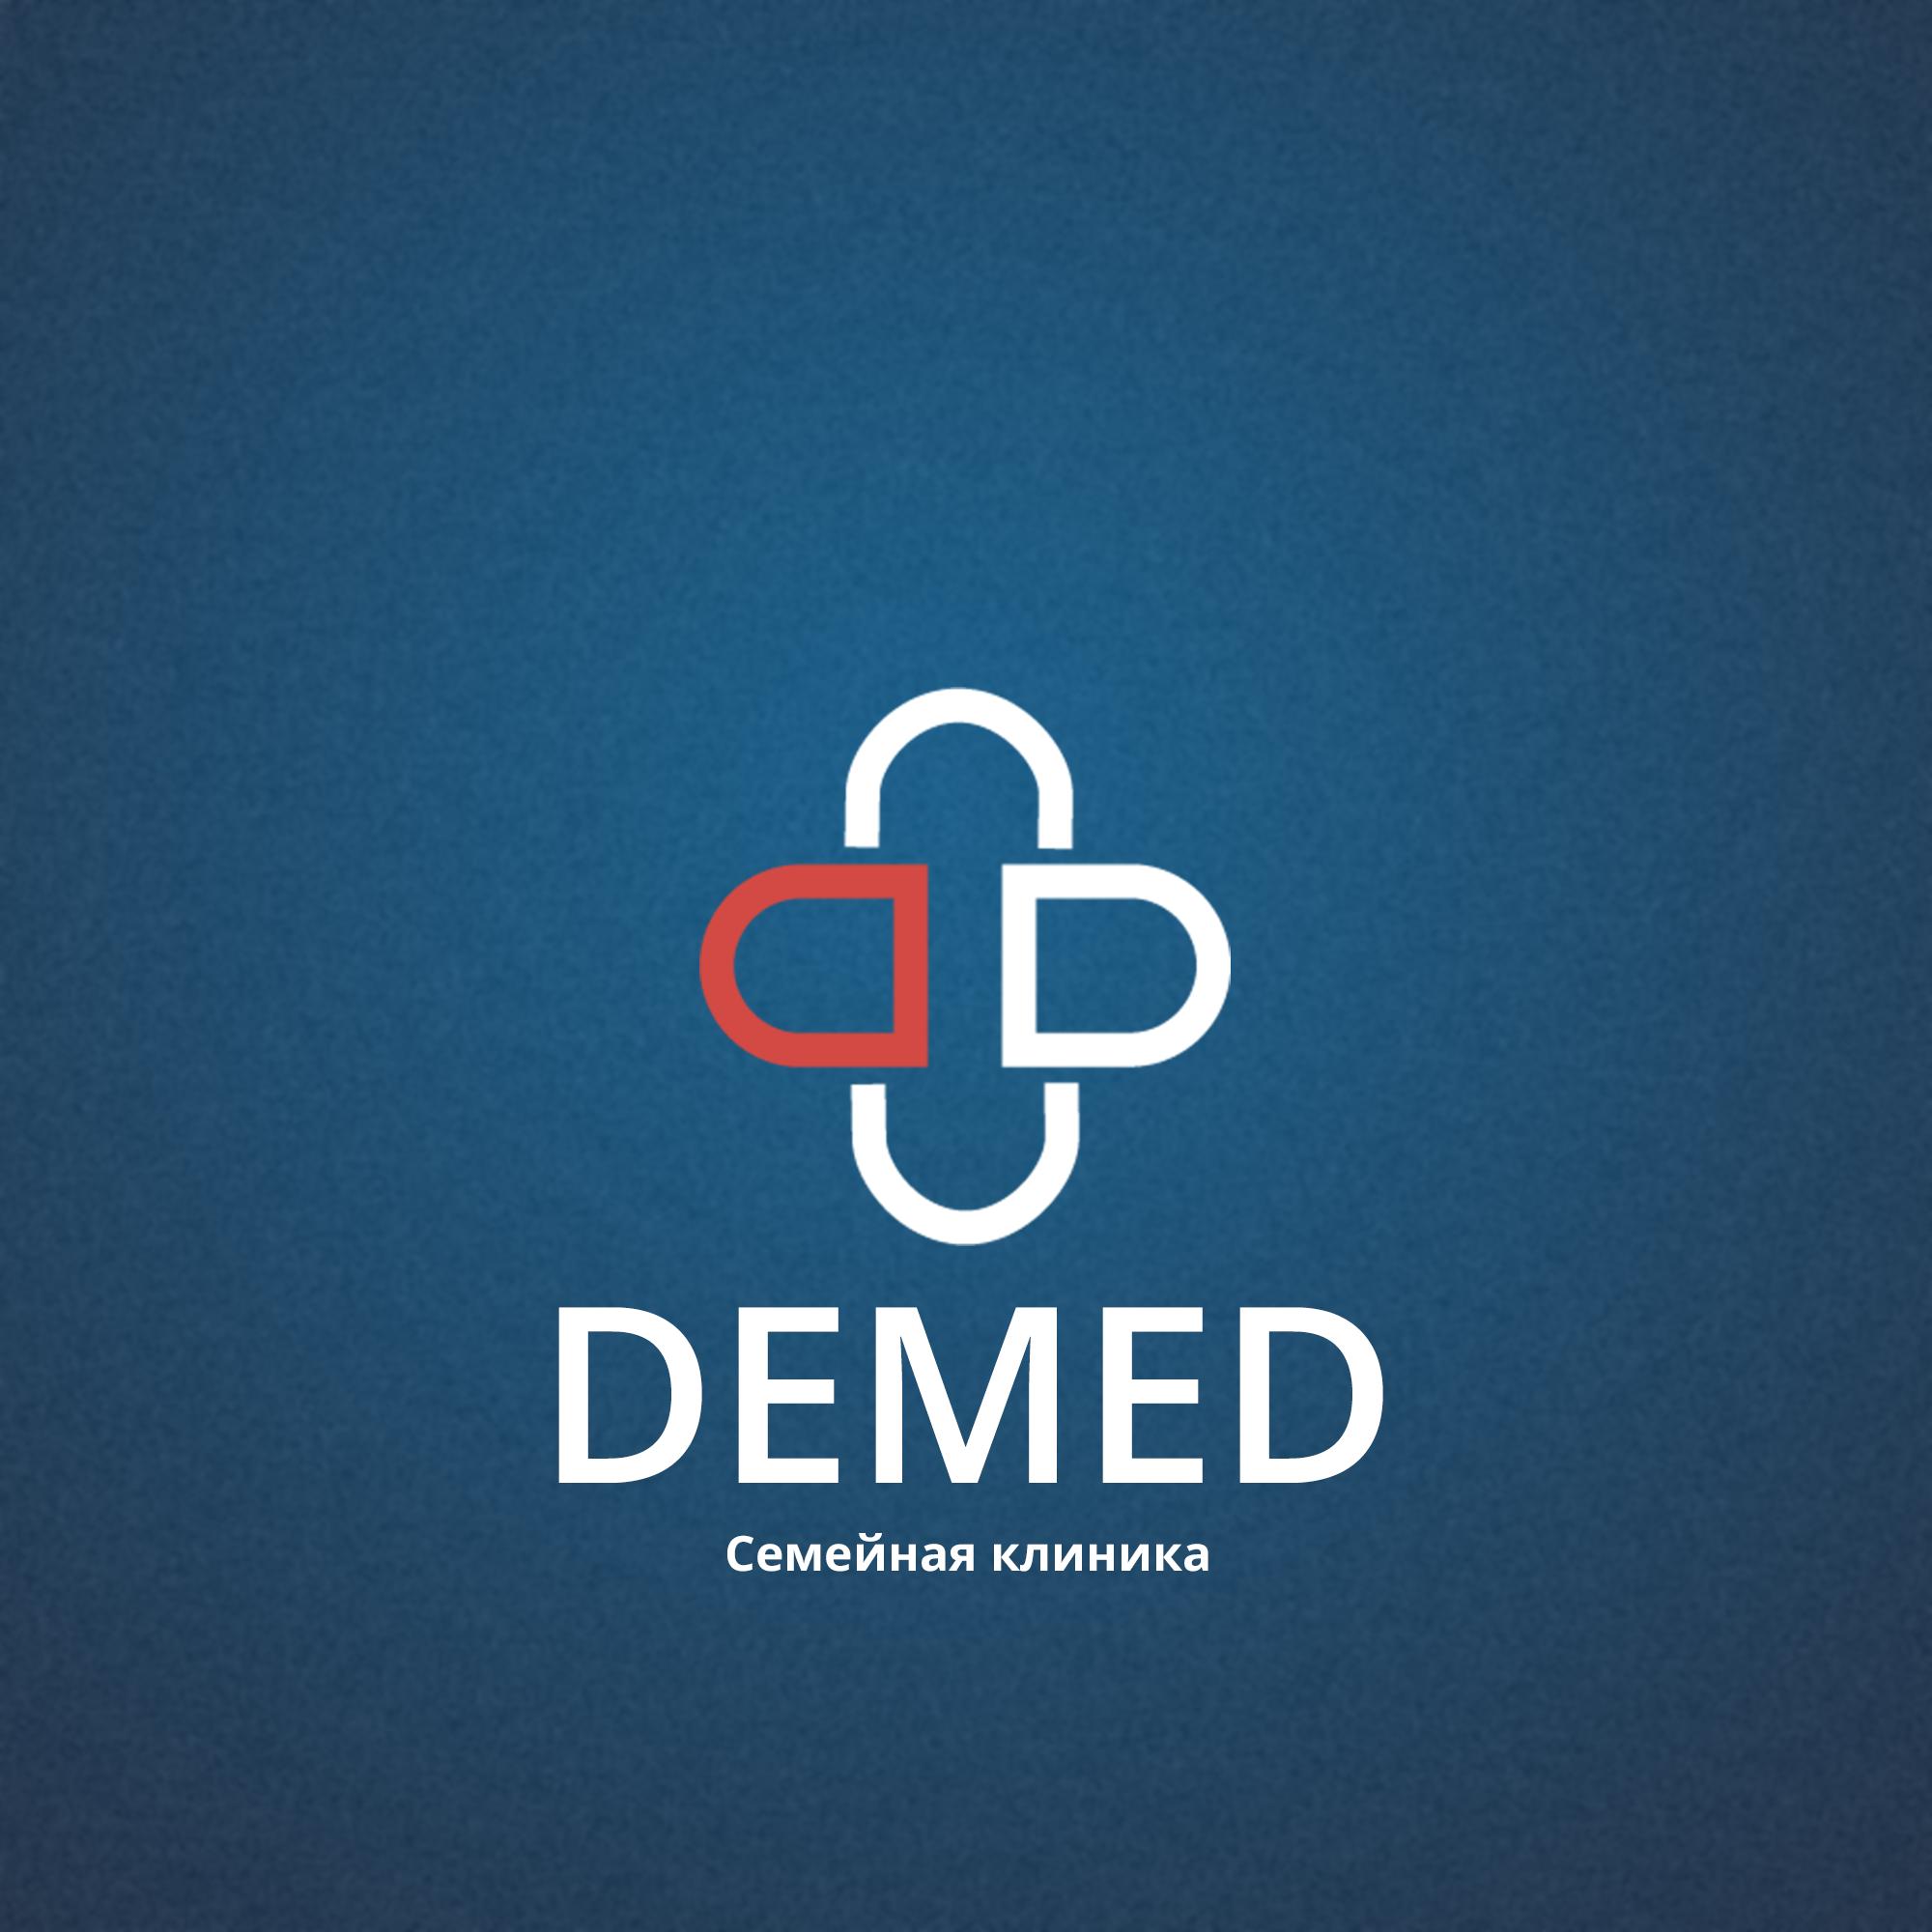 Логотип медицинского центра фото f_5575dc93b6e0843a.png